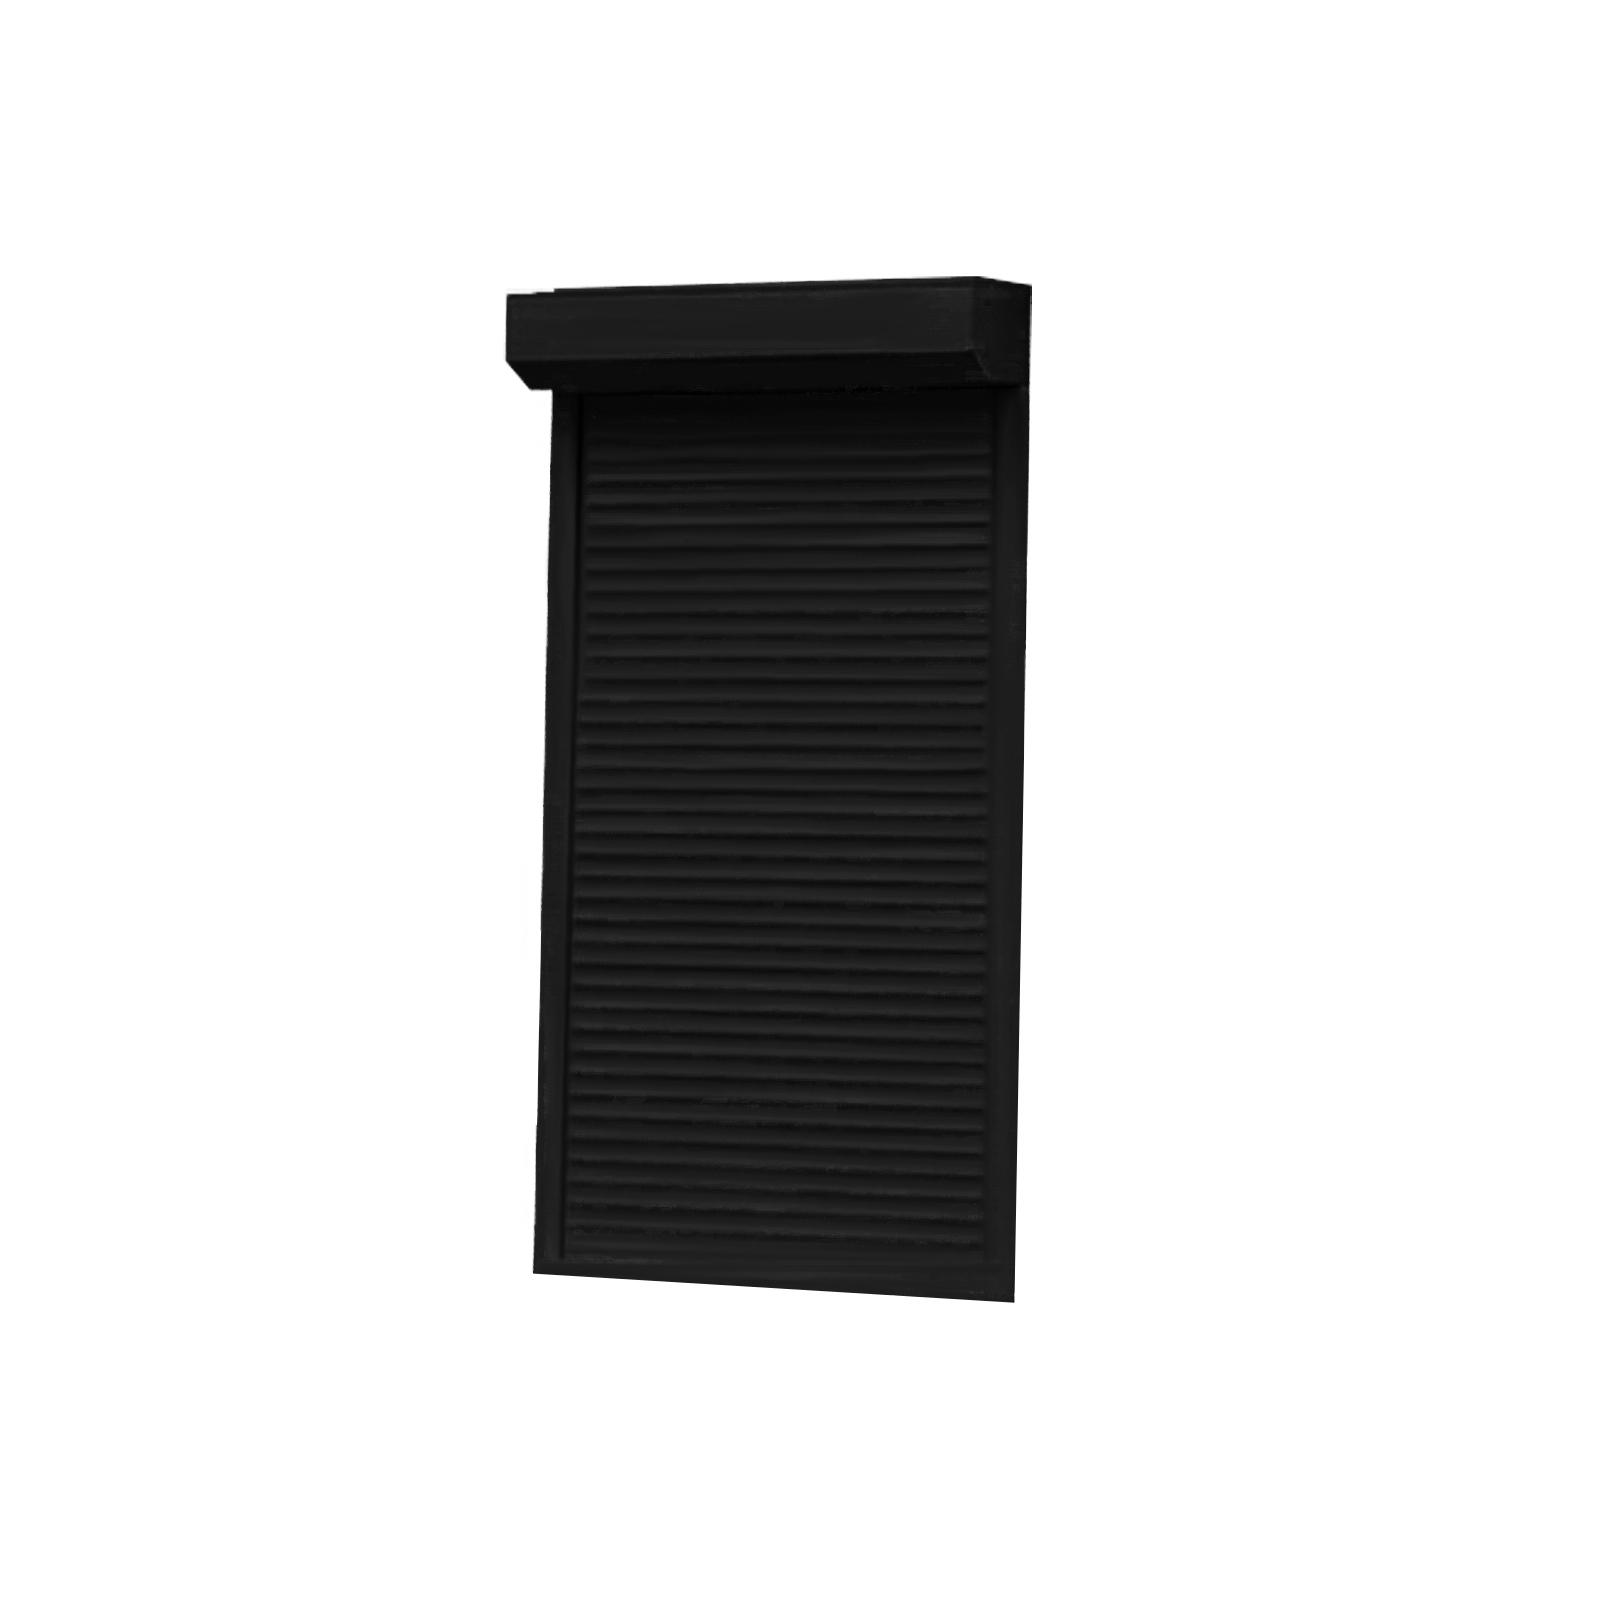 Everton 2001-2200mm H x 3000-3200mm W On-Wall Battery Roller Shutter